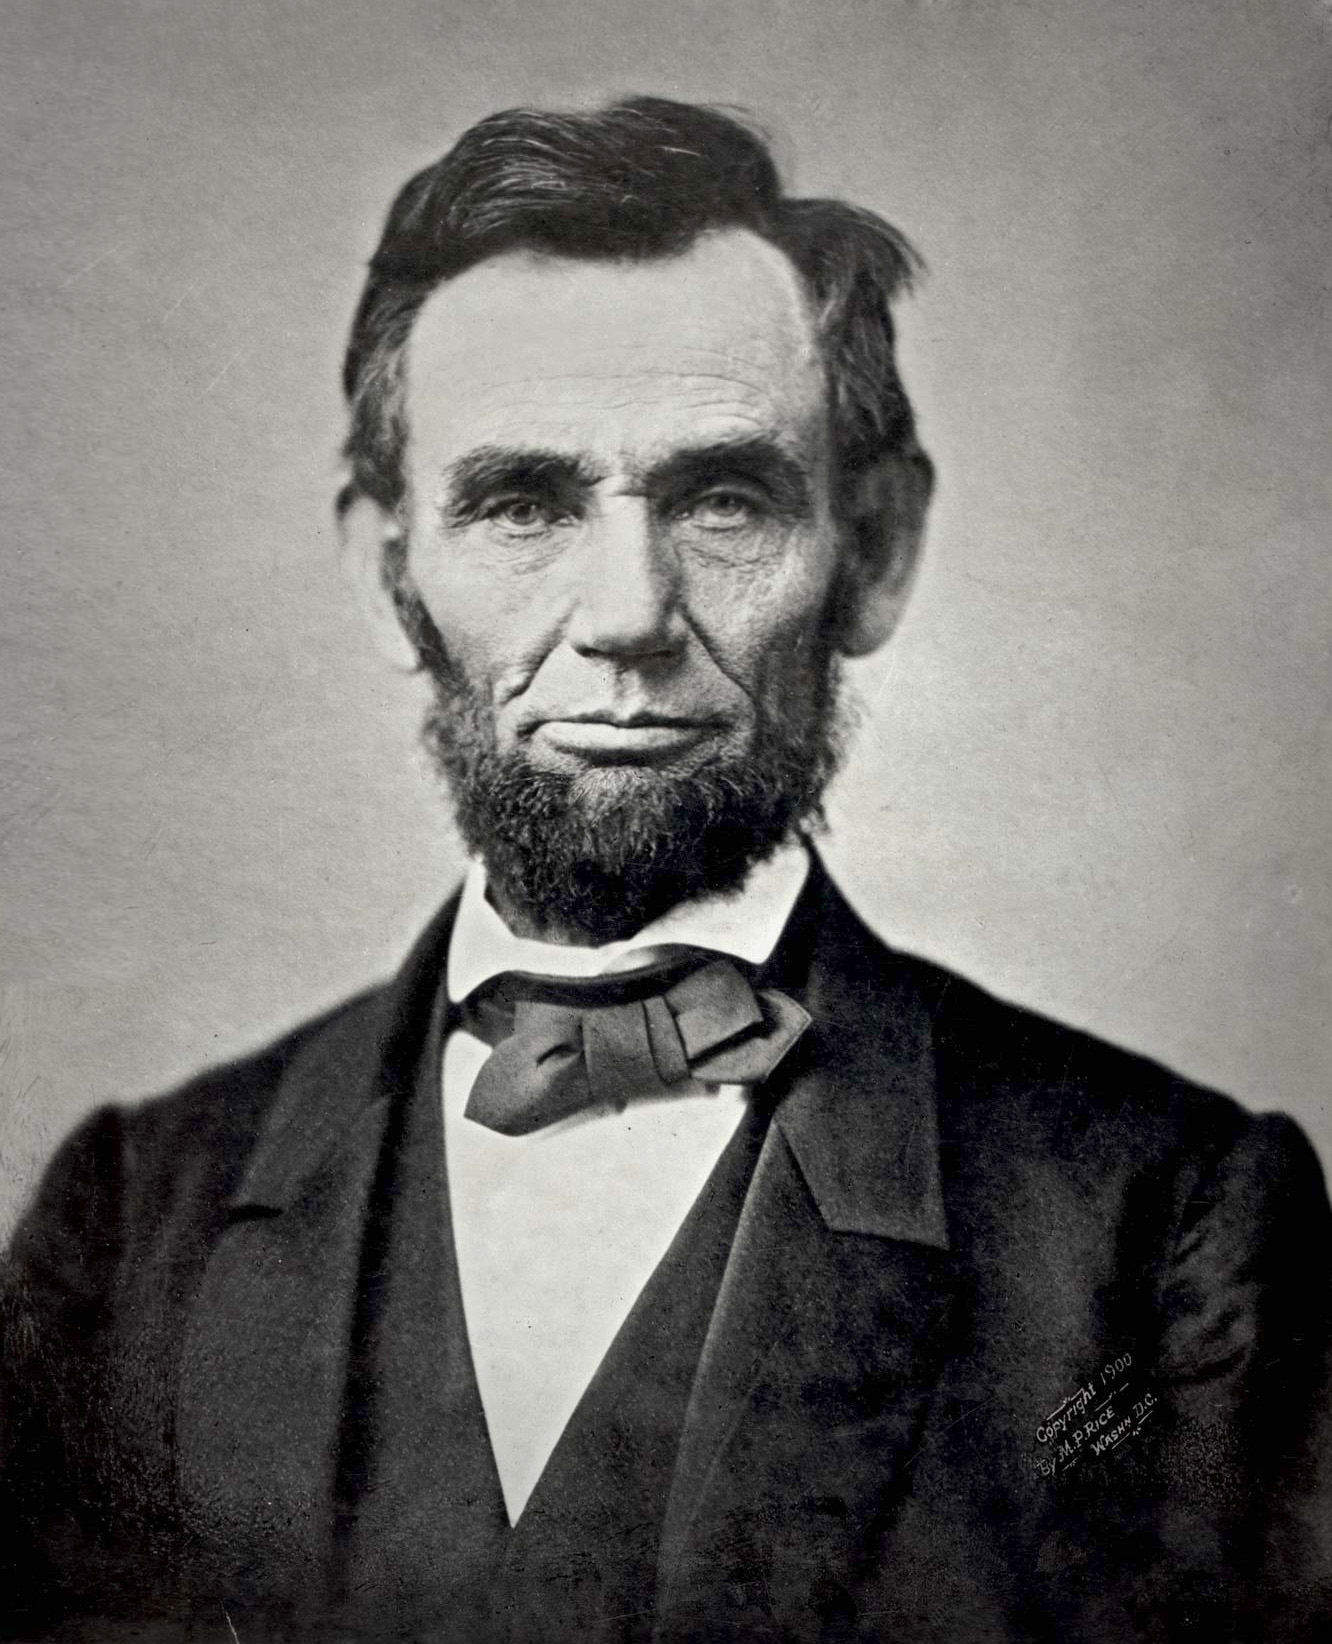 Lincoln in 1863, half-way through the Civil War.